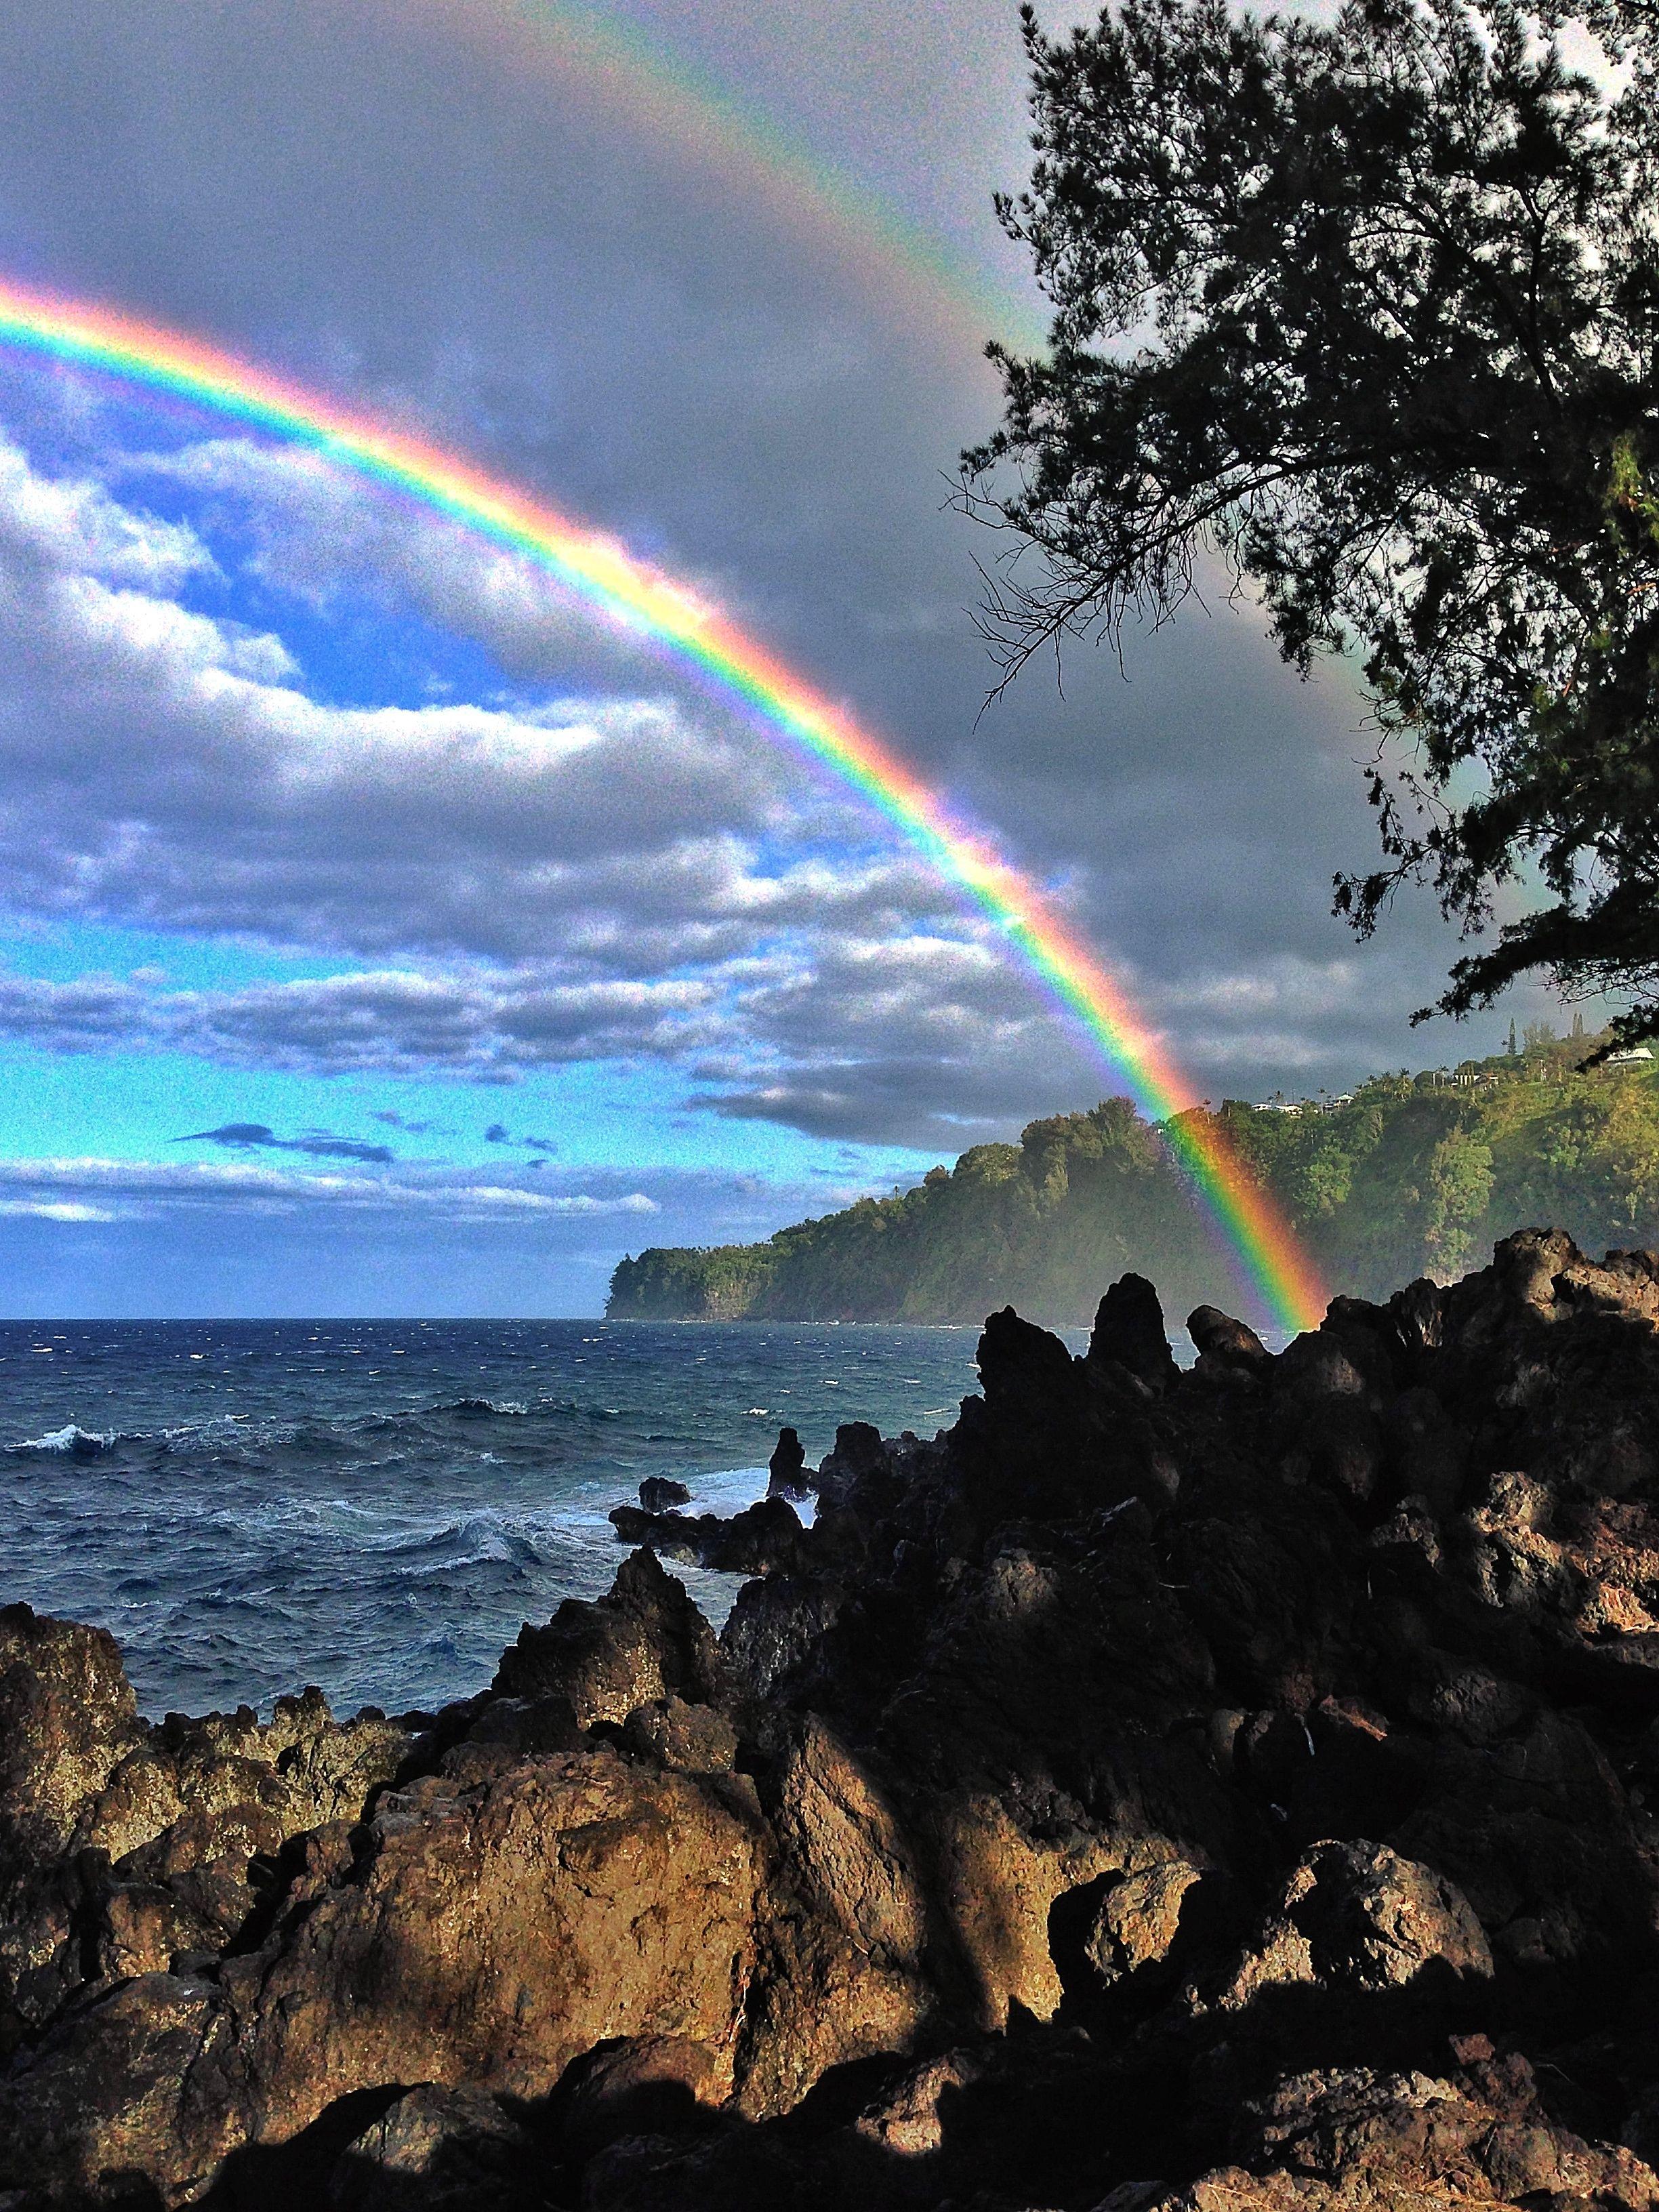 down at laupahoehoe point on big island hawaii the rainbows were so rh pinterest com